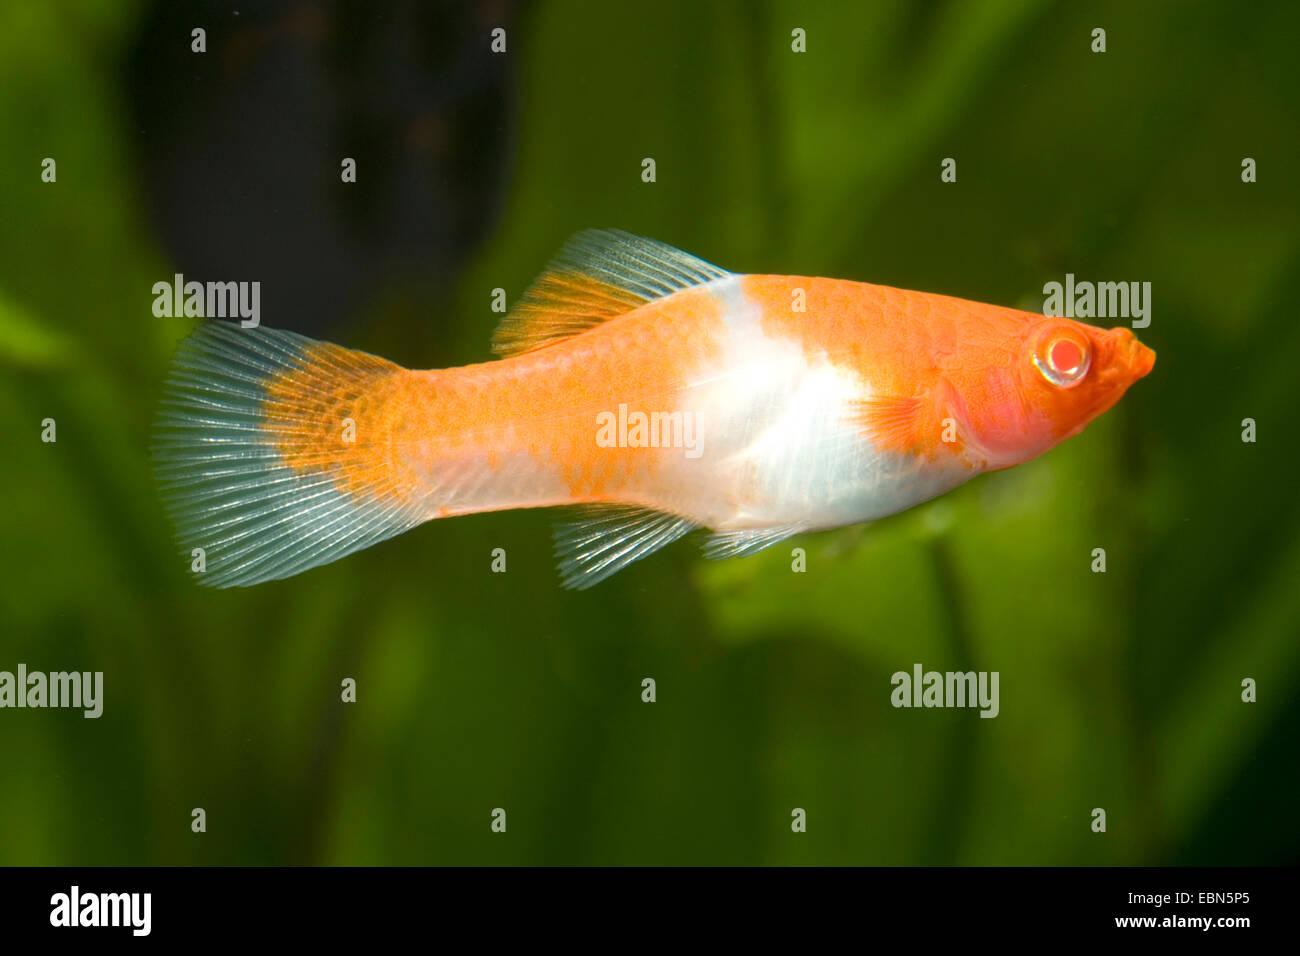 Albino F Stock Photos & Albino F Stock Images - Alamy